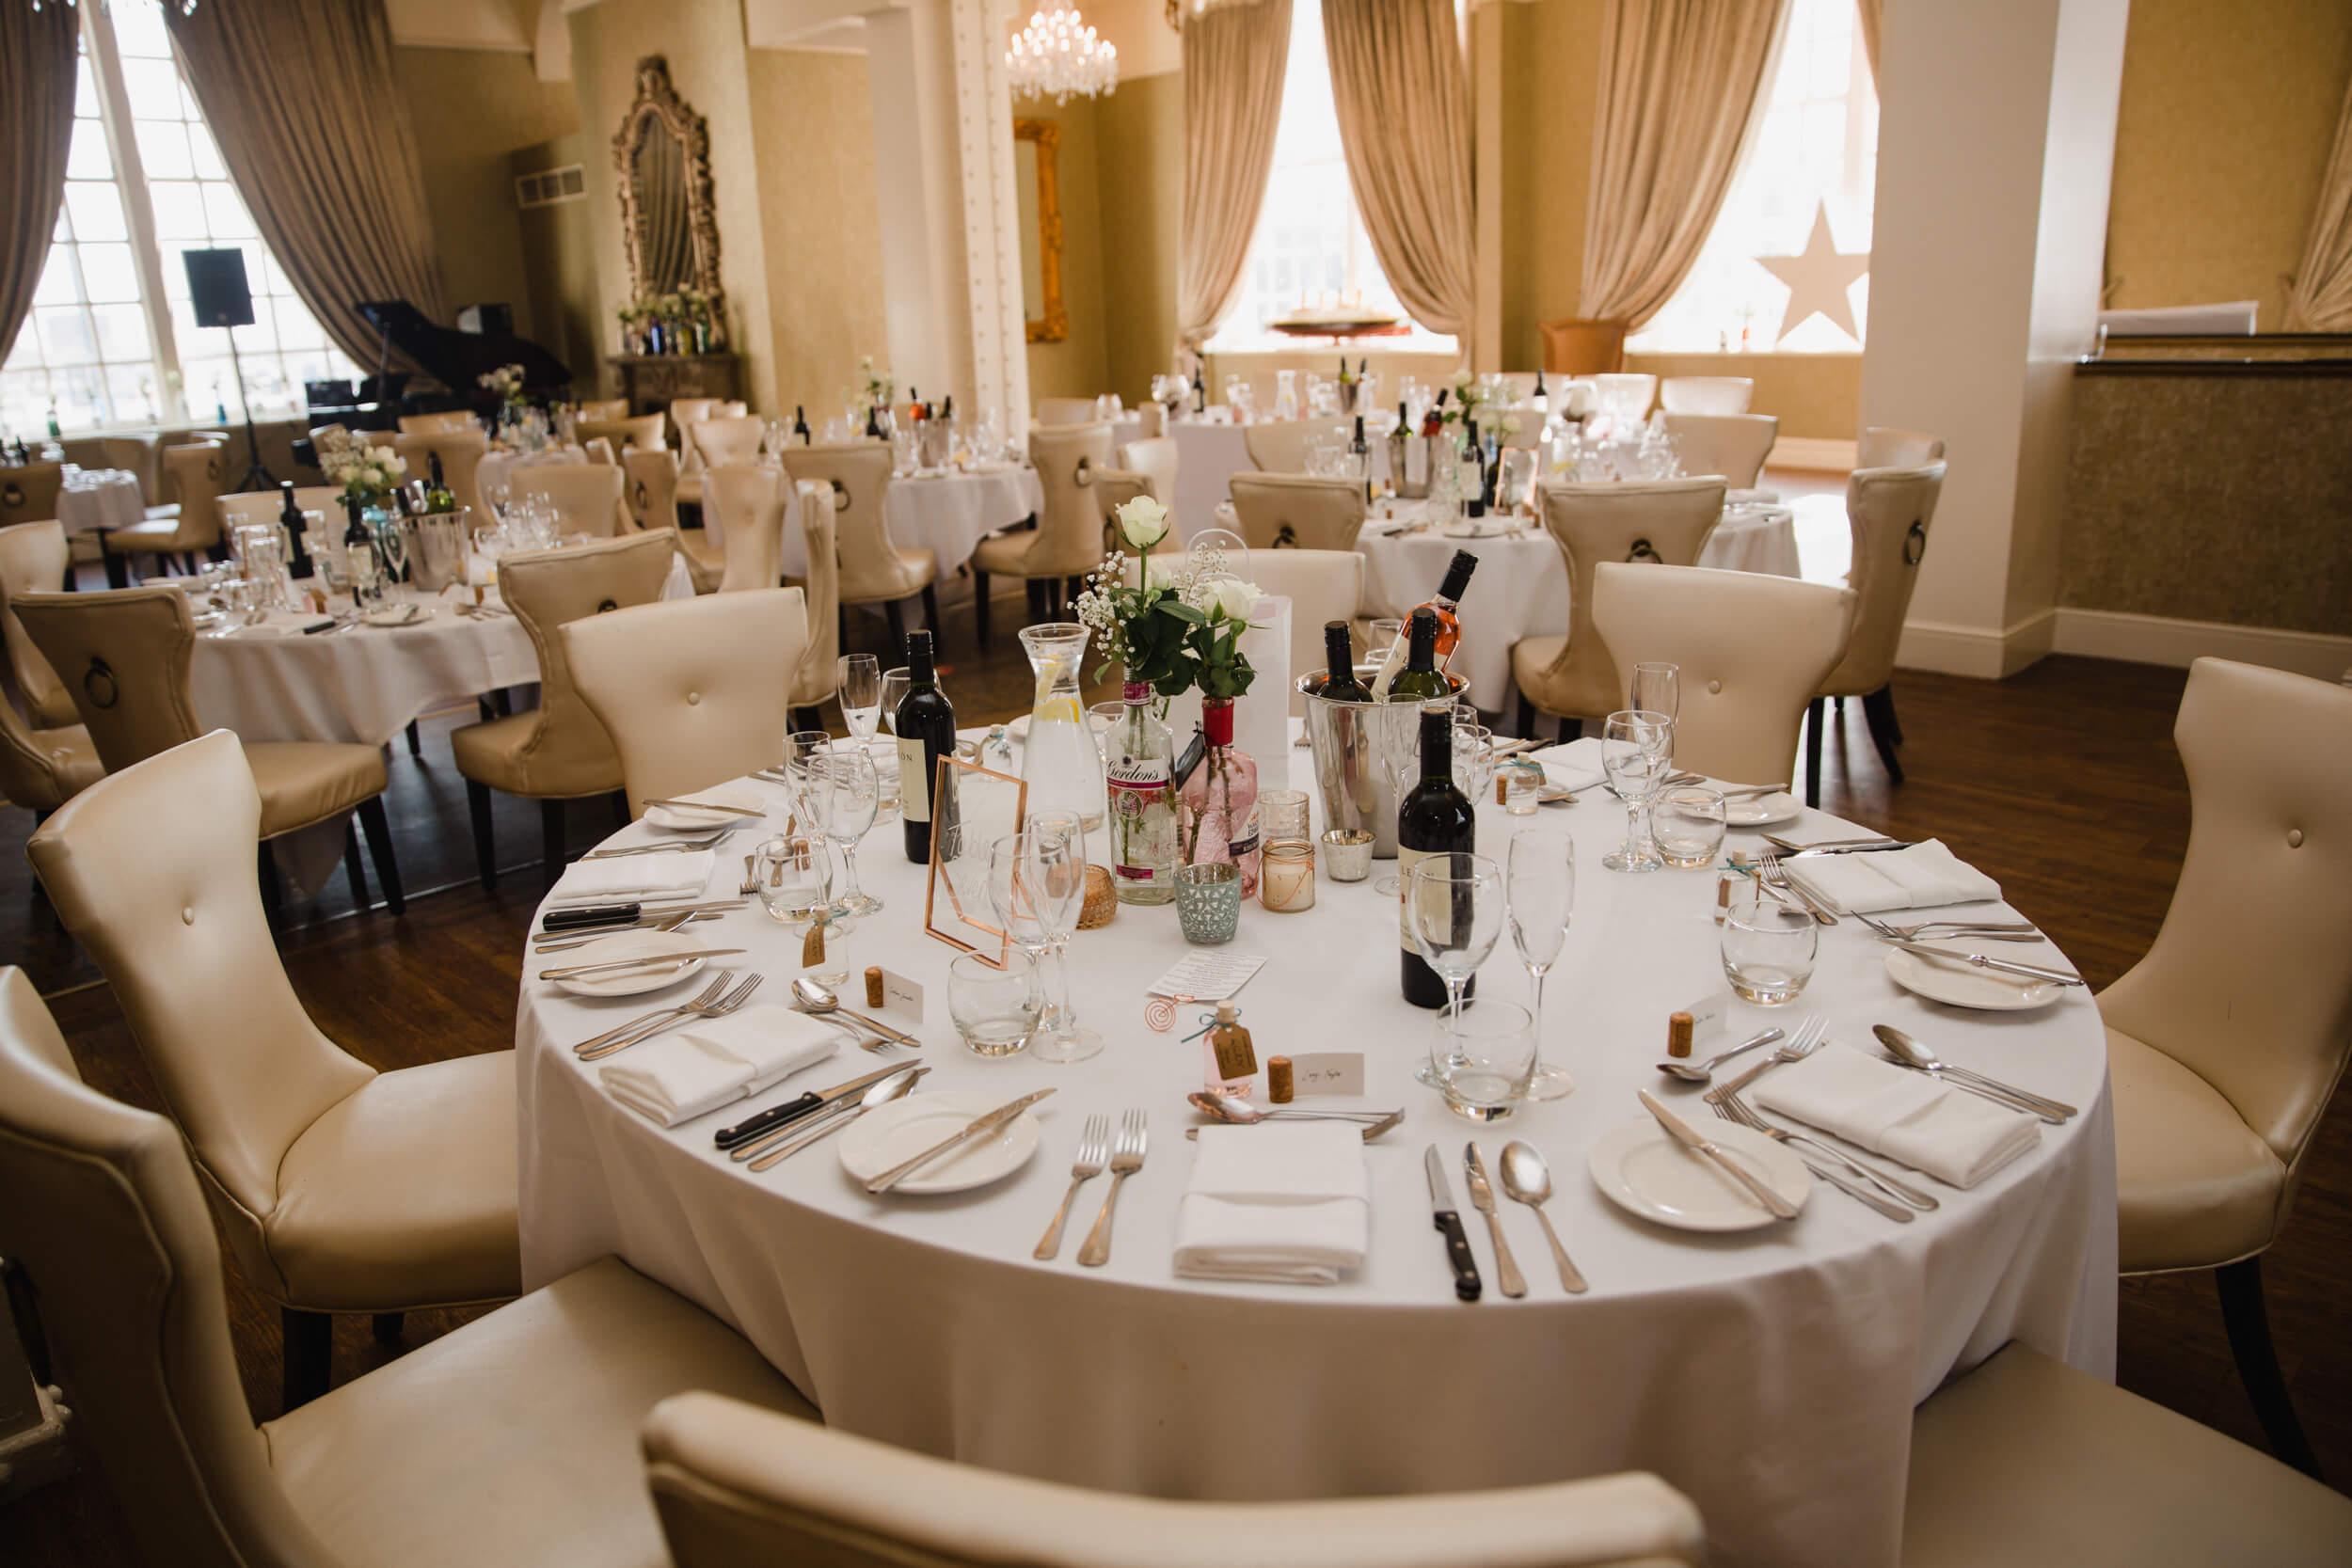 30_James_Street_Hotel_Wedding_Venue_035.jpg